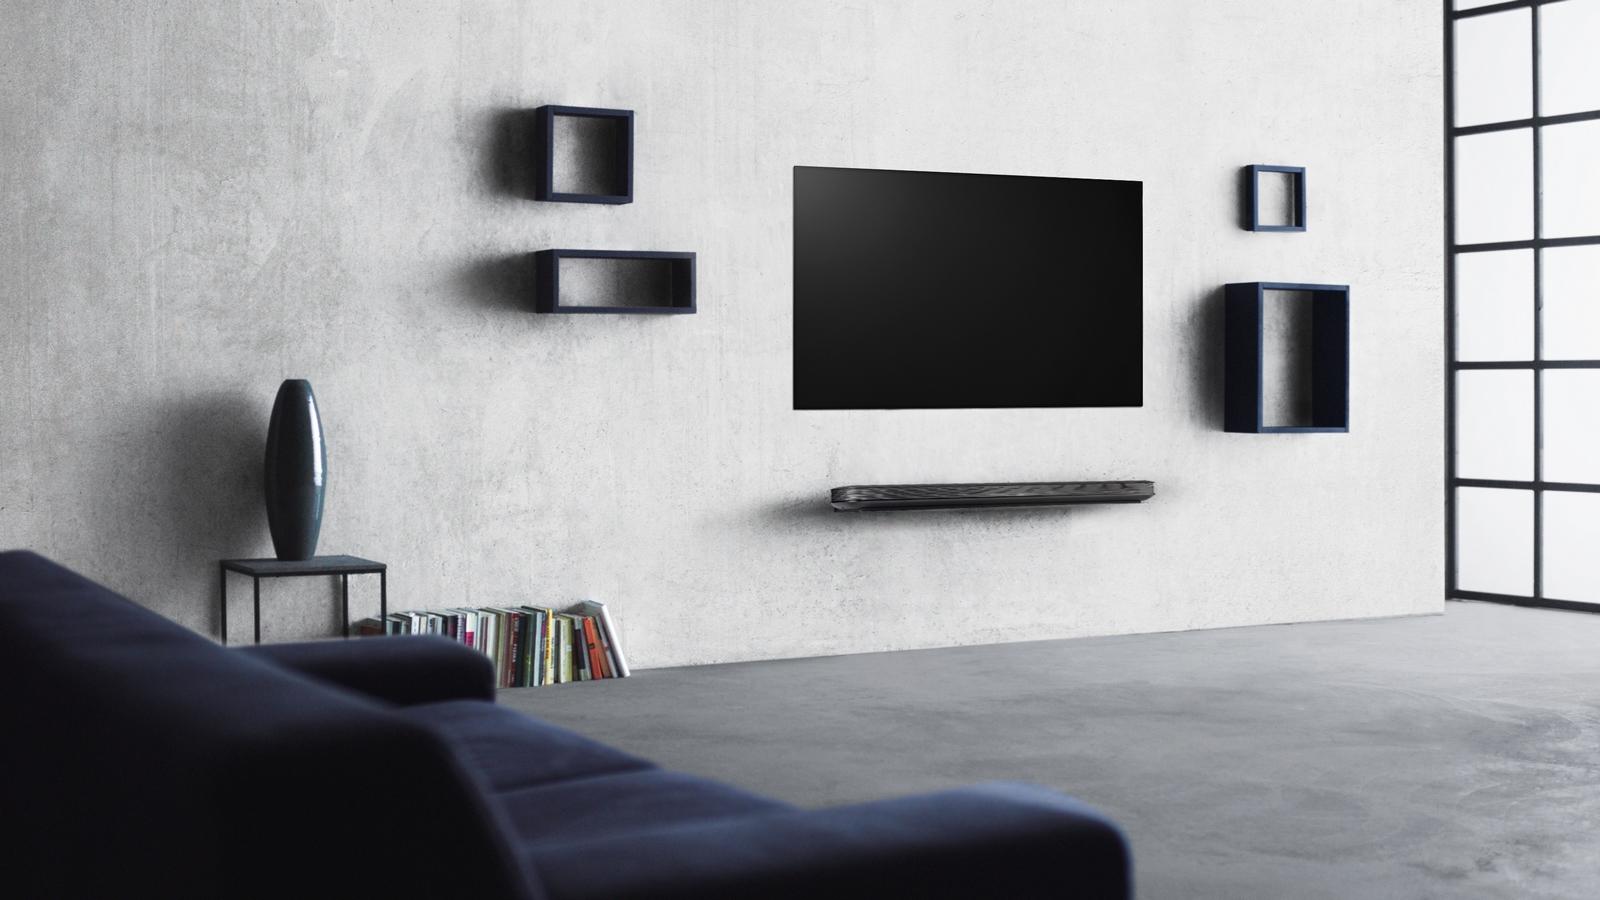 LG SIGNATURE OLED TV 6